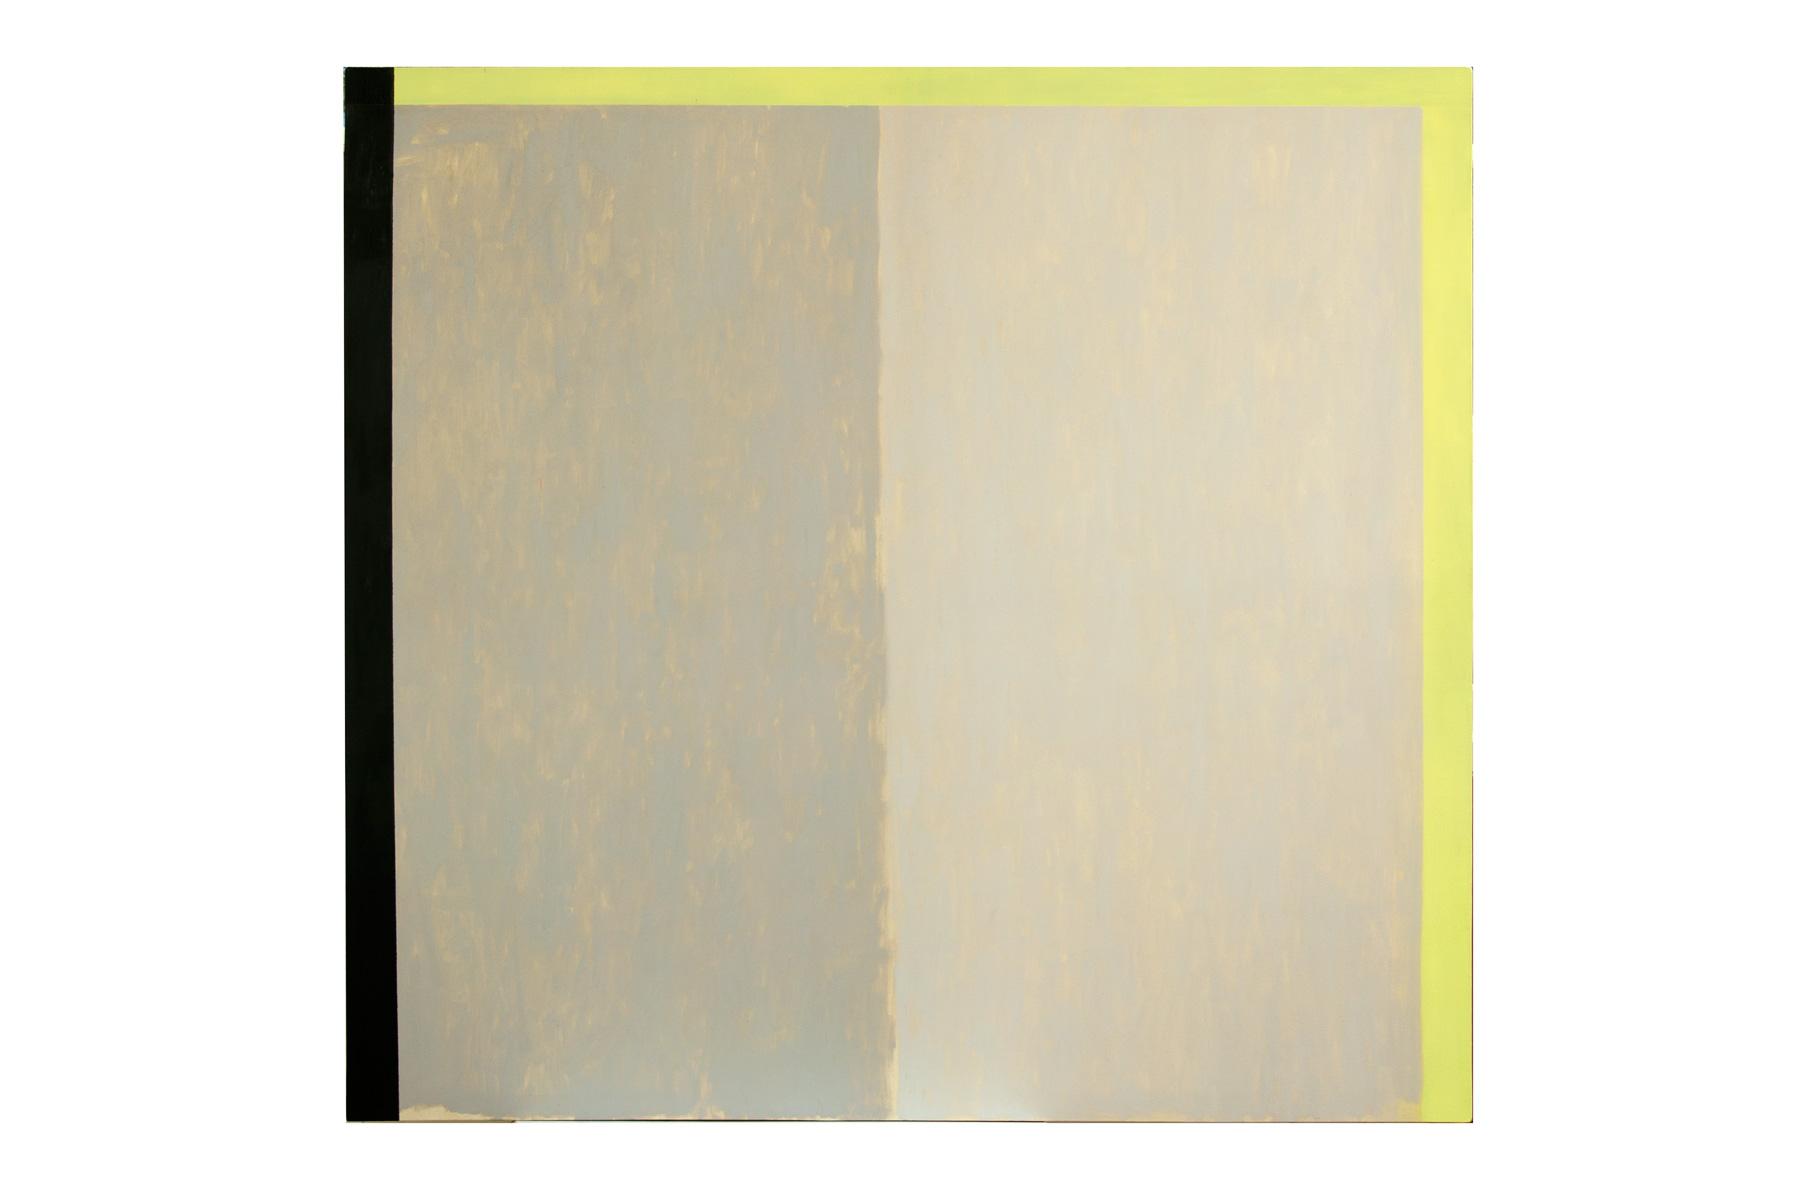 Intervencion 3, oleo sobre lienzo, 150 x 160 cms